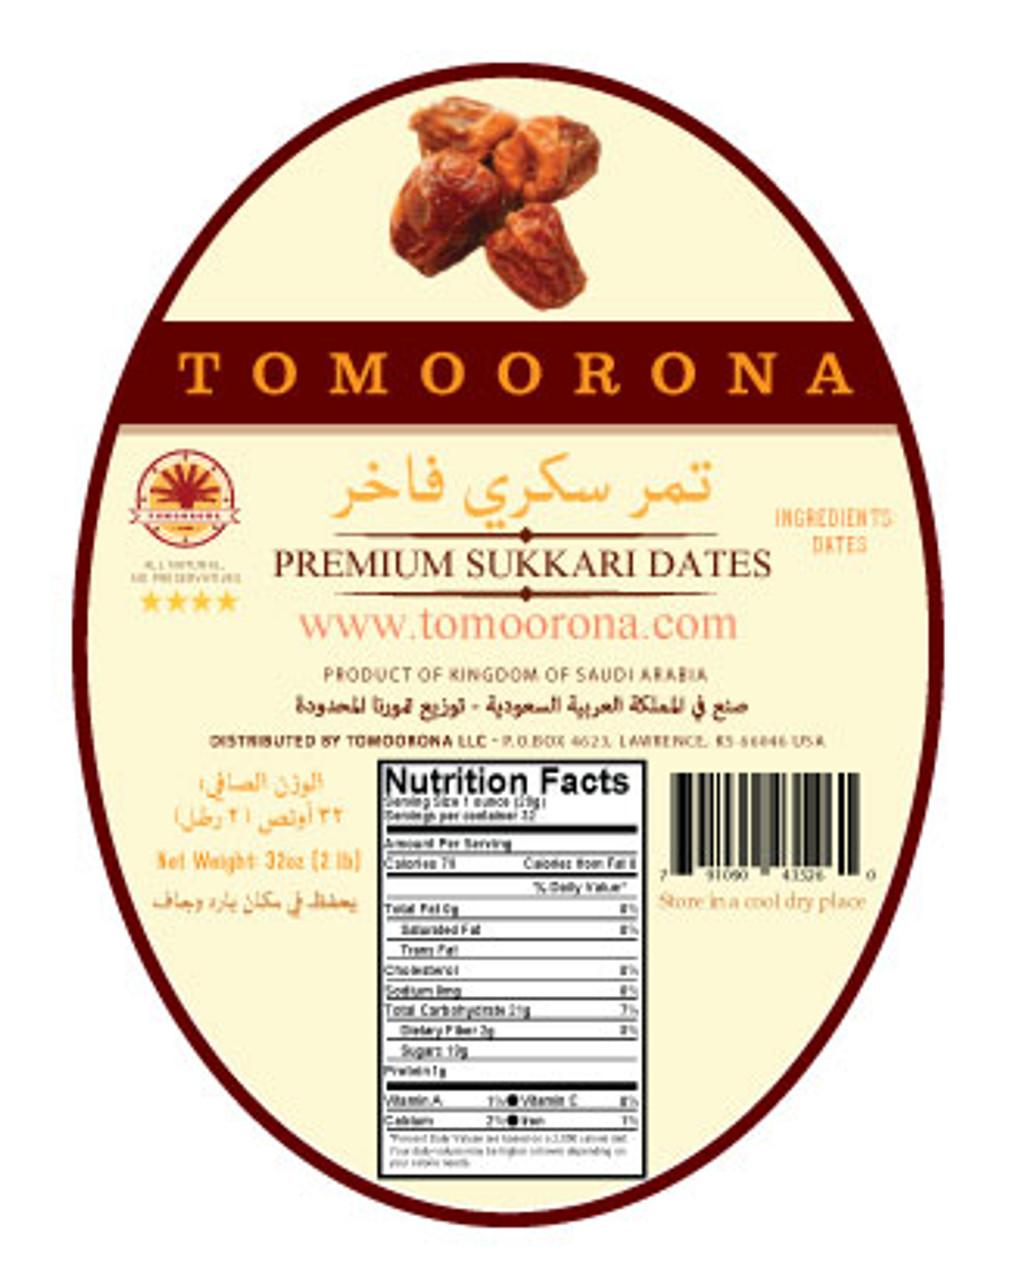 1kg Premium Sukkari Date كيلو تمر سكري فاخر Tomoorona